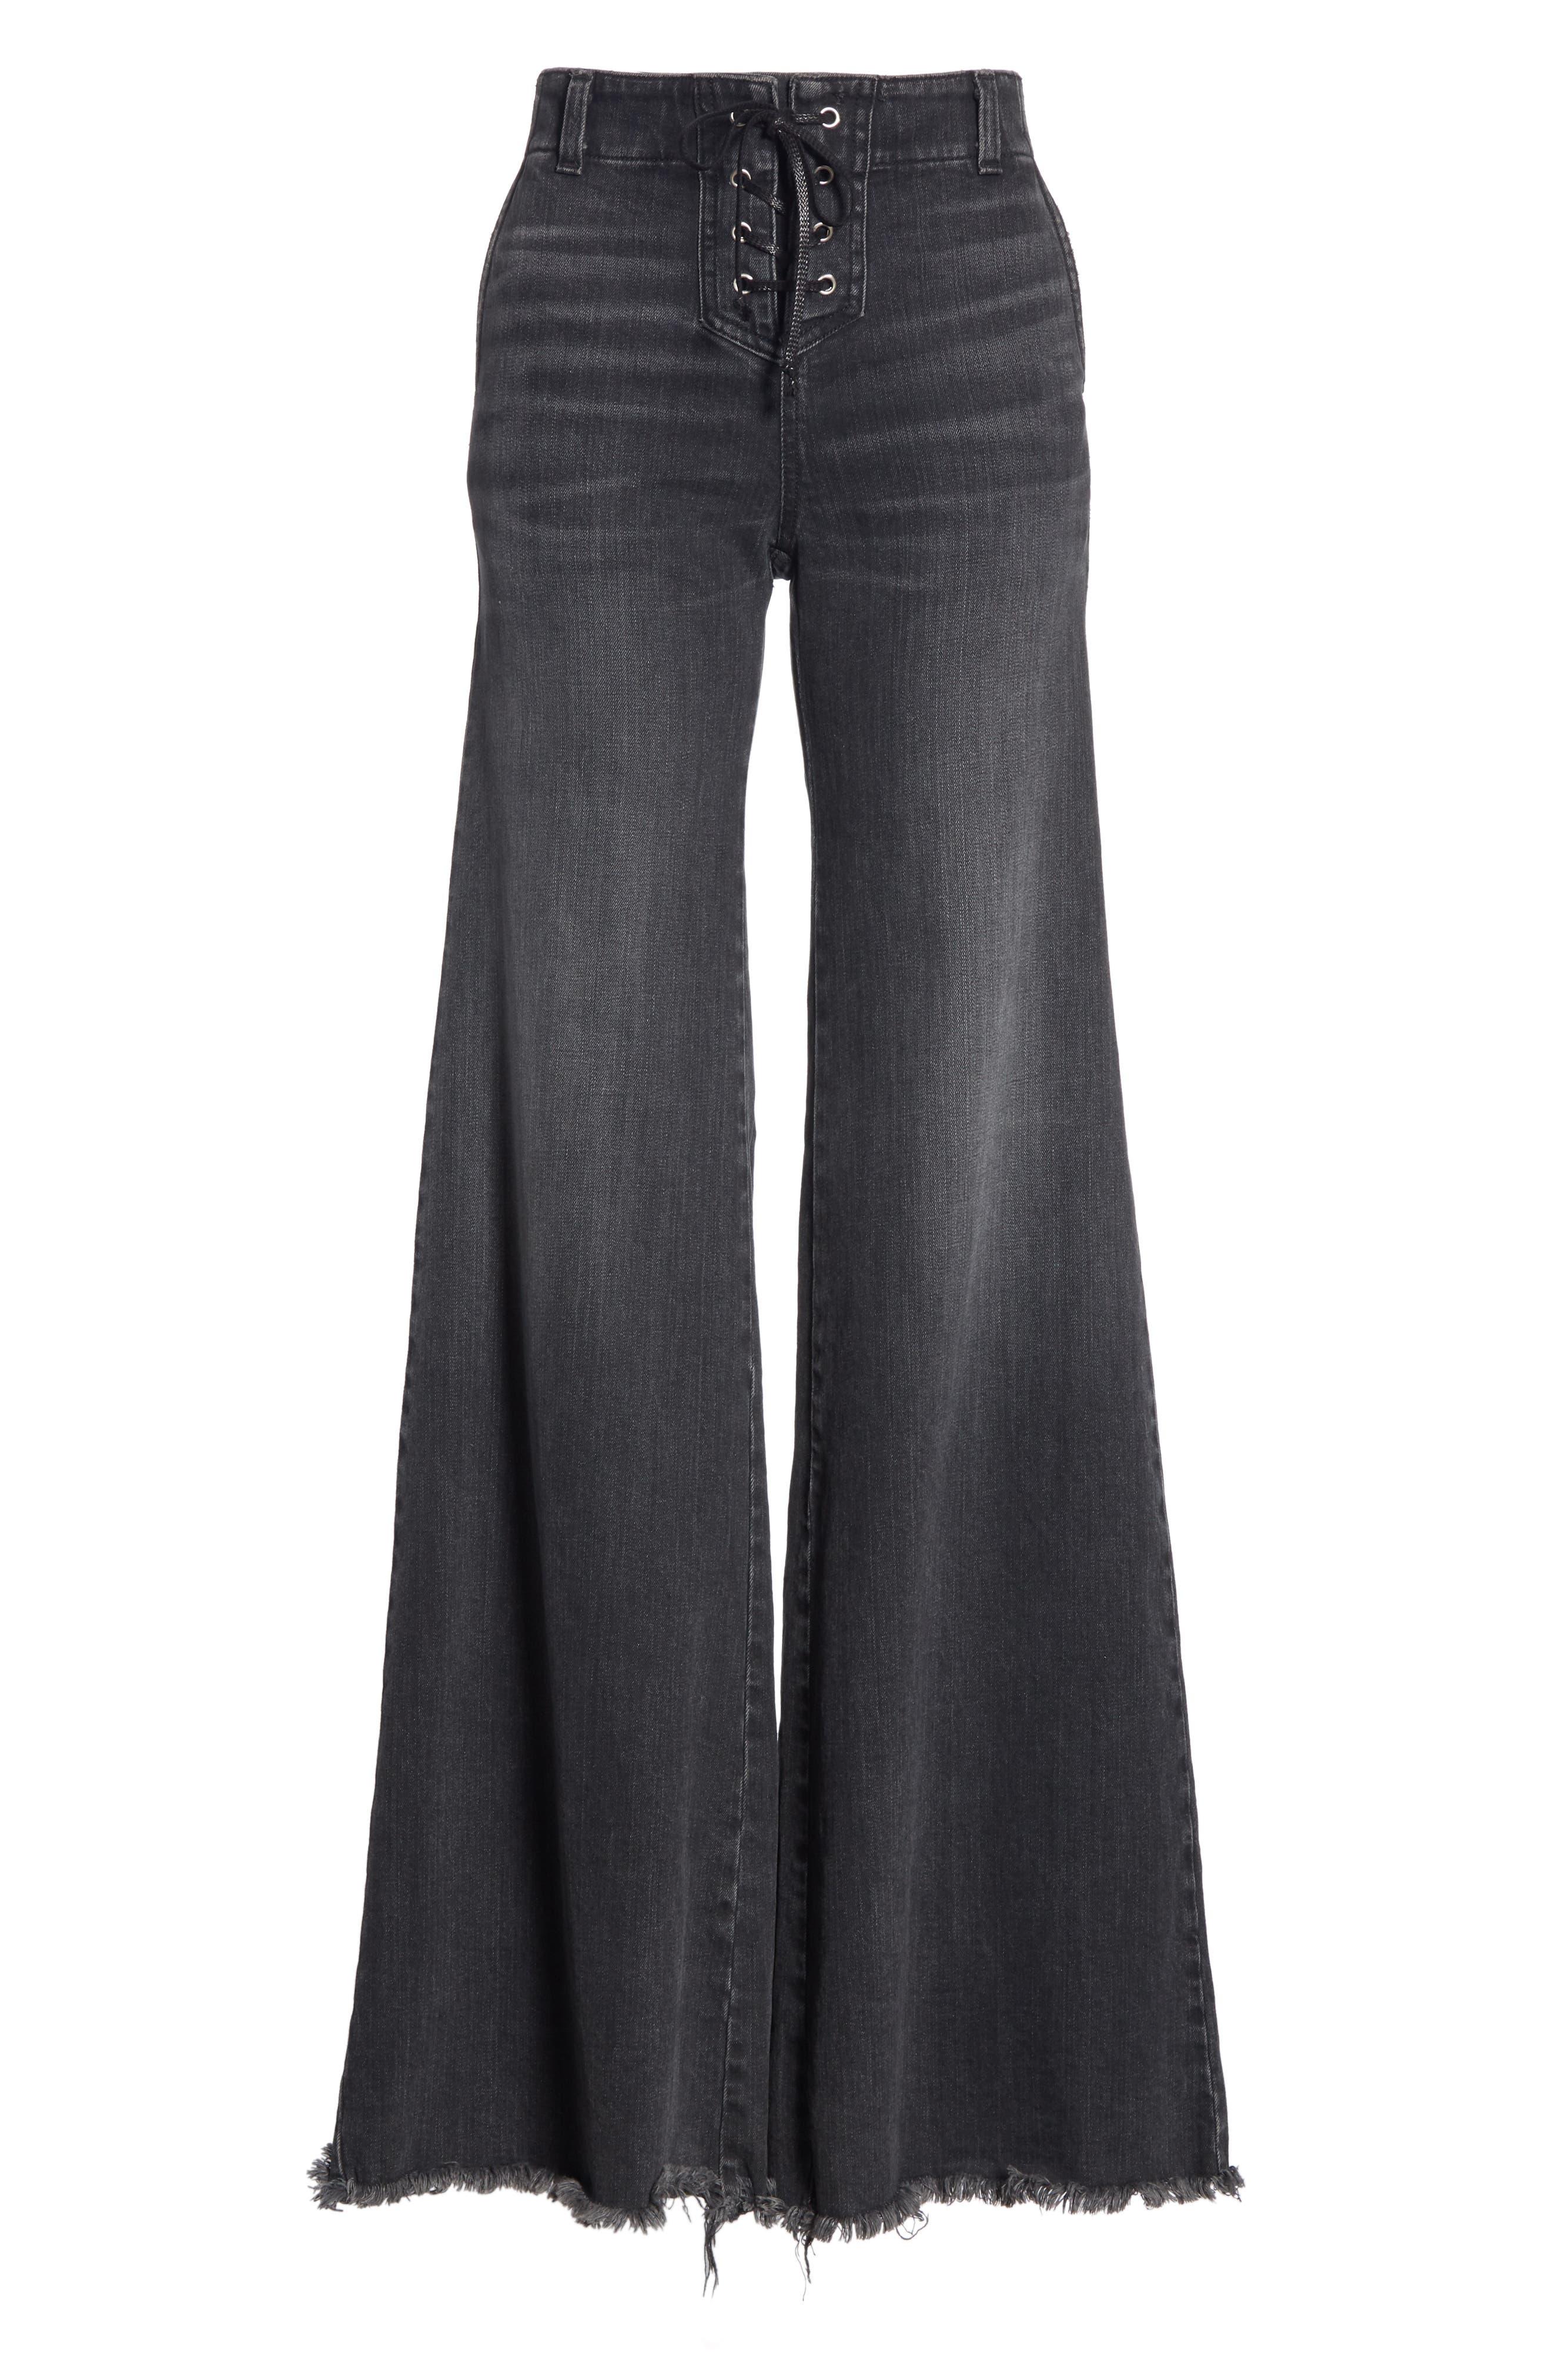 NILI LOTAN, Wade Lace-Up Wide Leg Jeans, Alternate thumbnail 7, color, VINTAGE BLACK